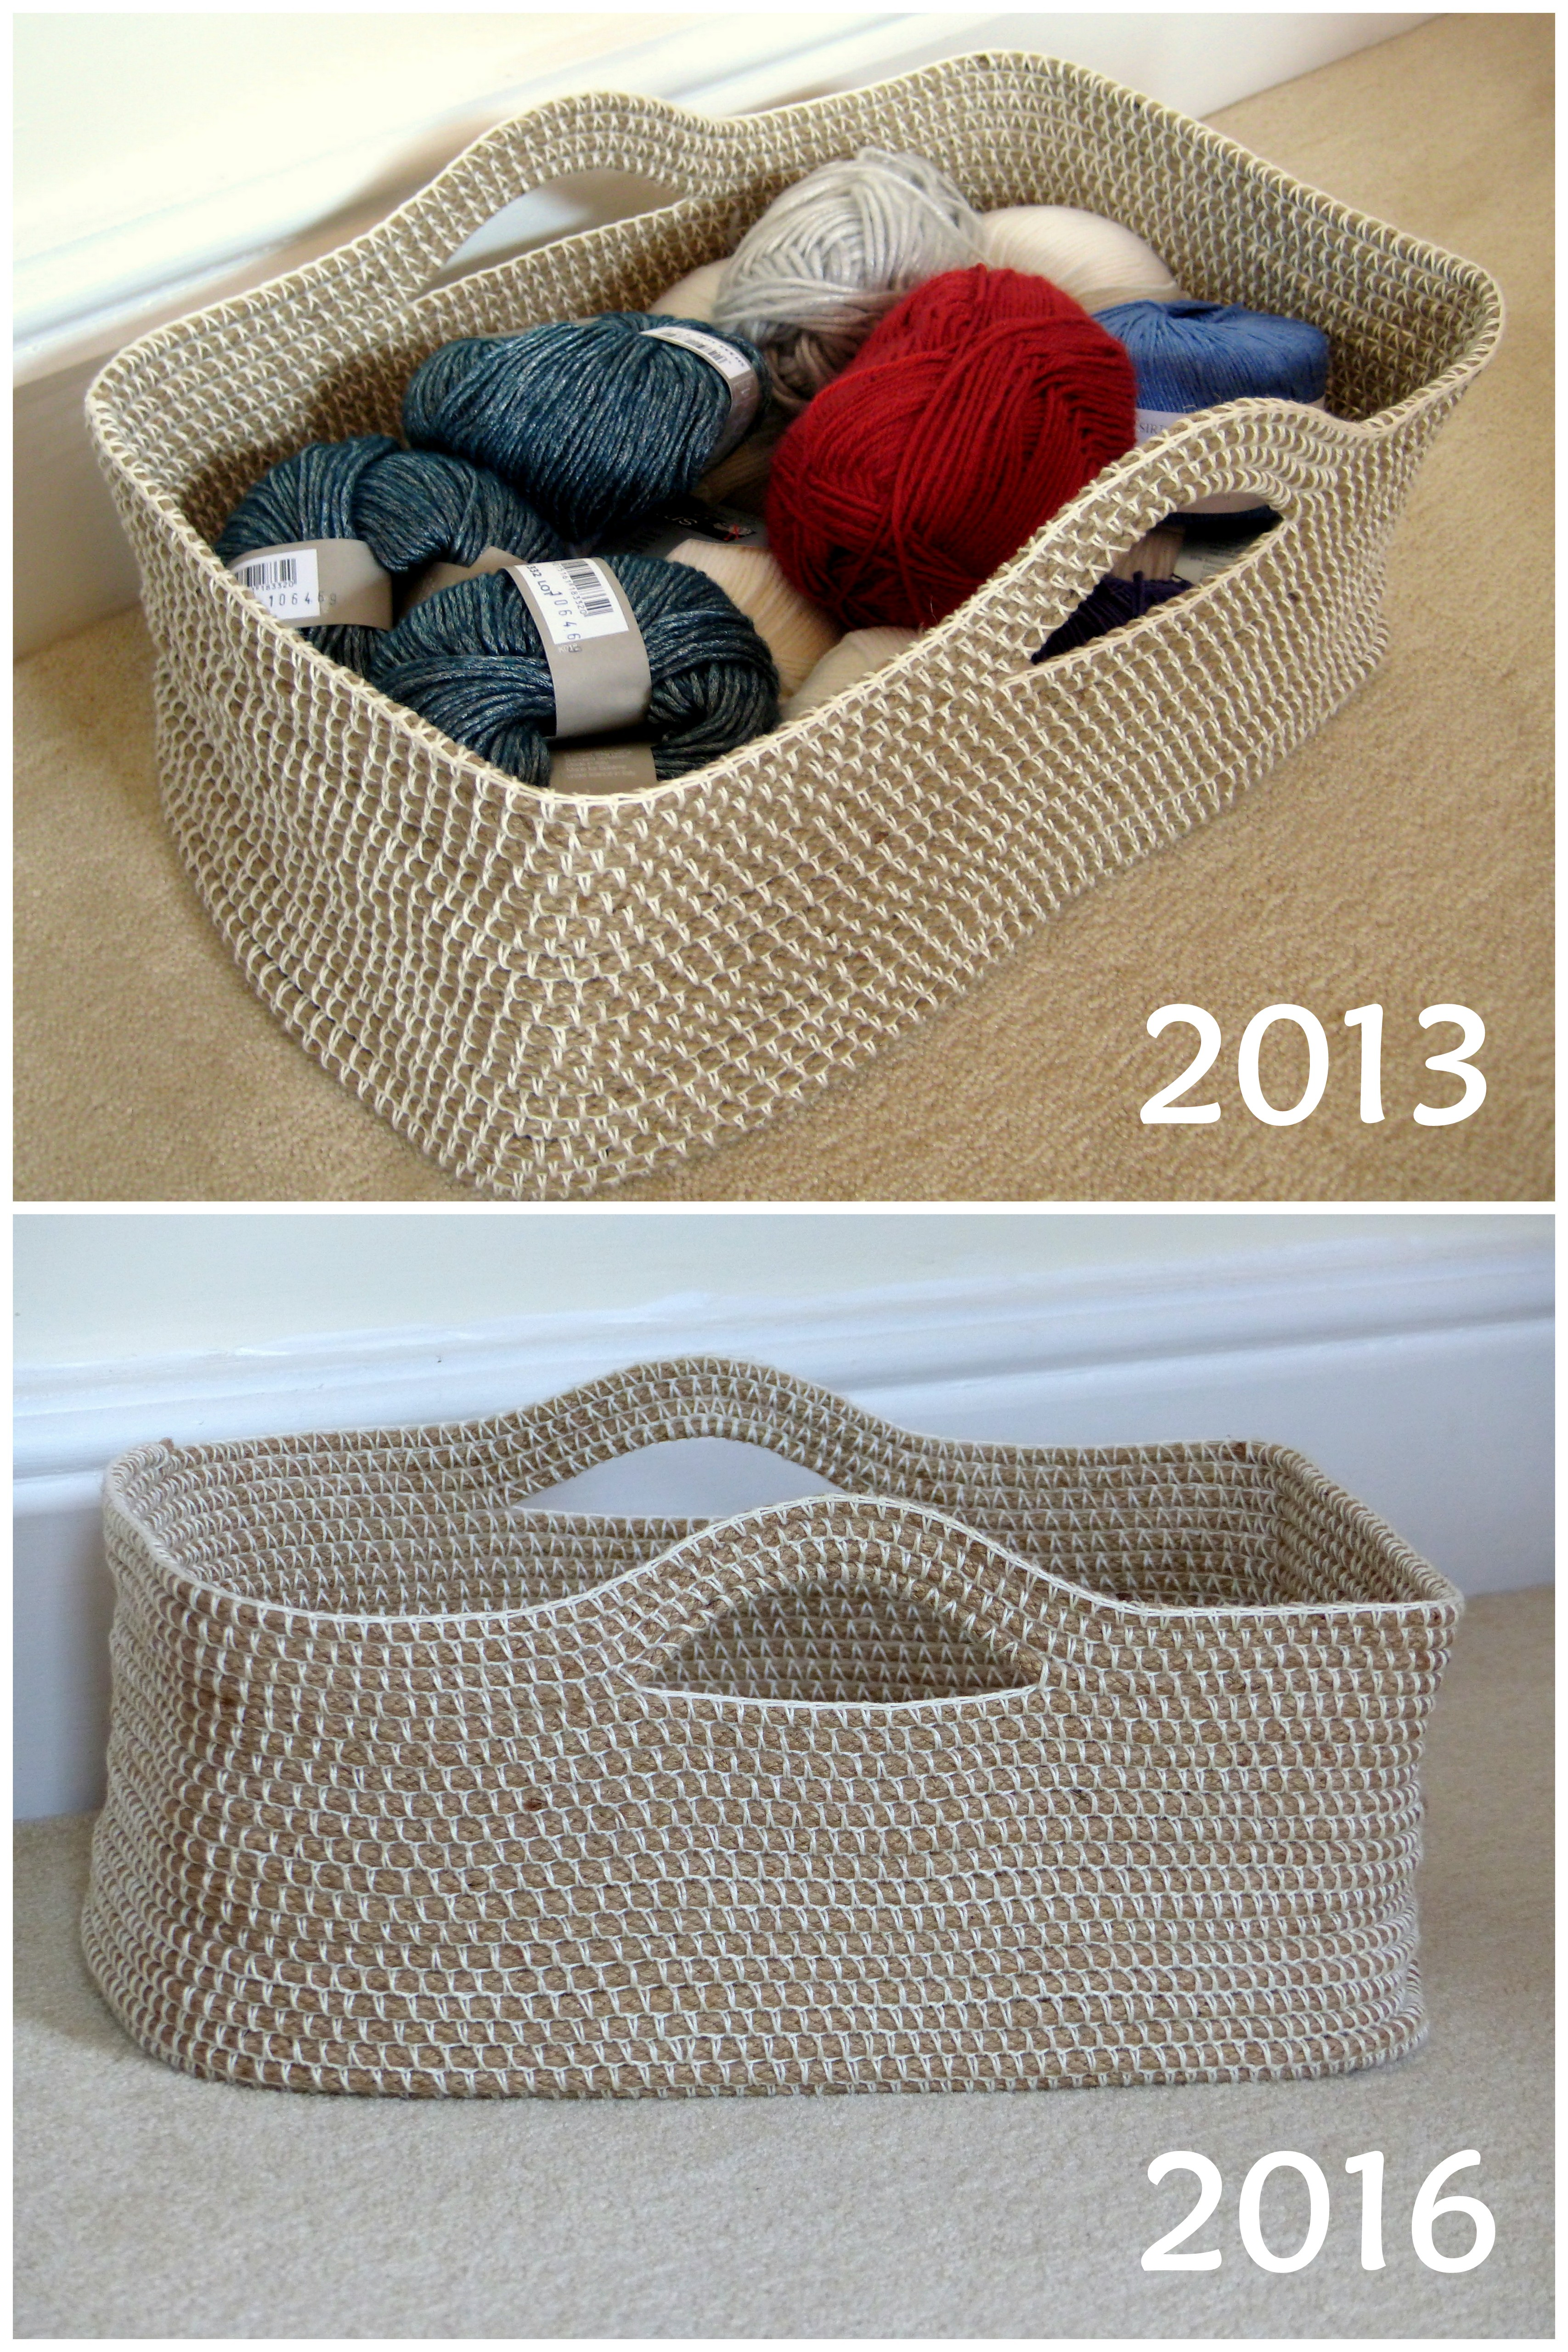 Crochet Rope Basket Free Pattern : Crochet Rope Basket Update Make My Day Creative